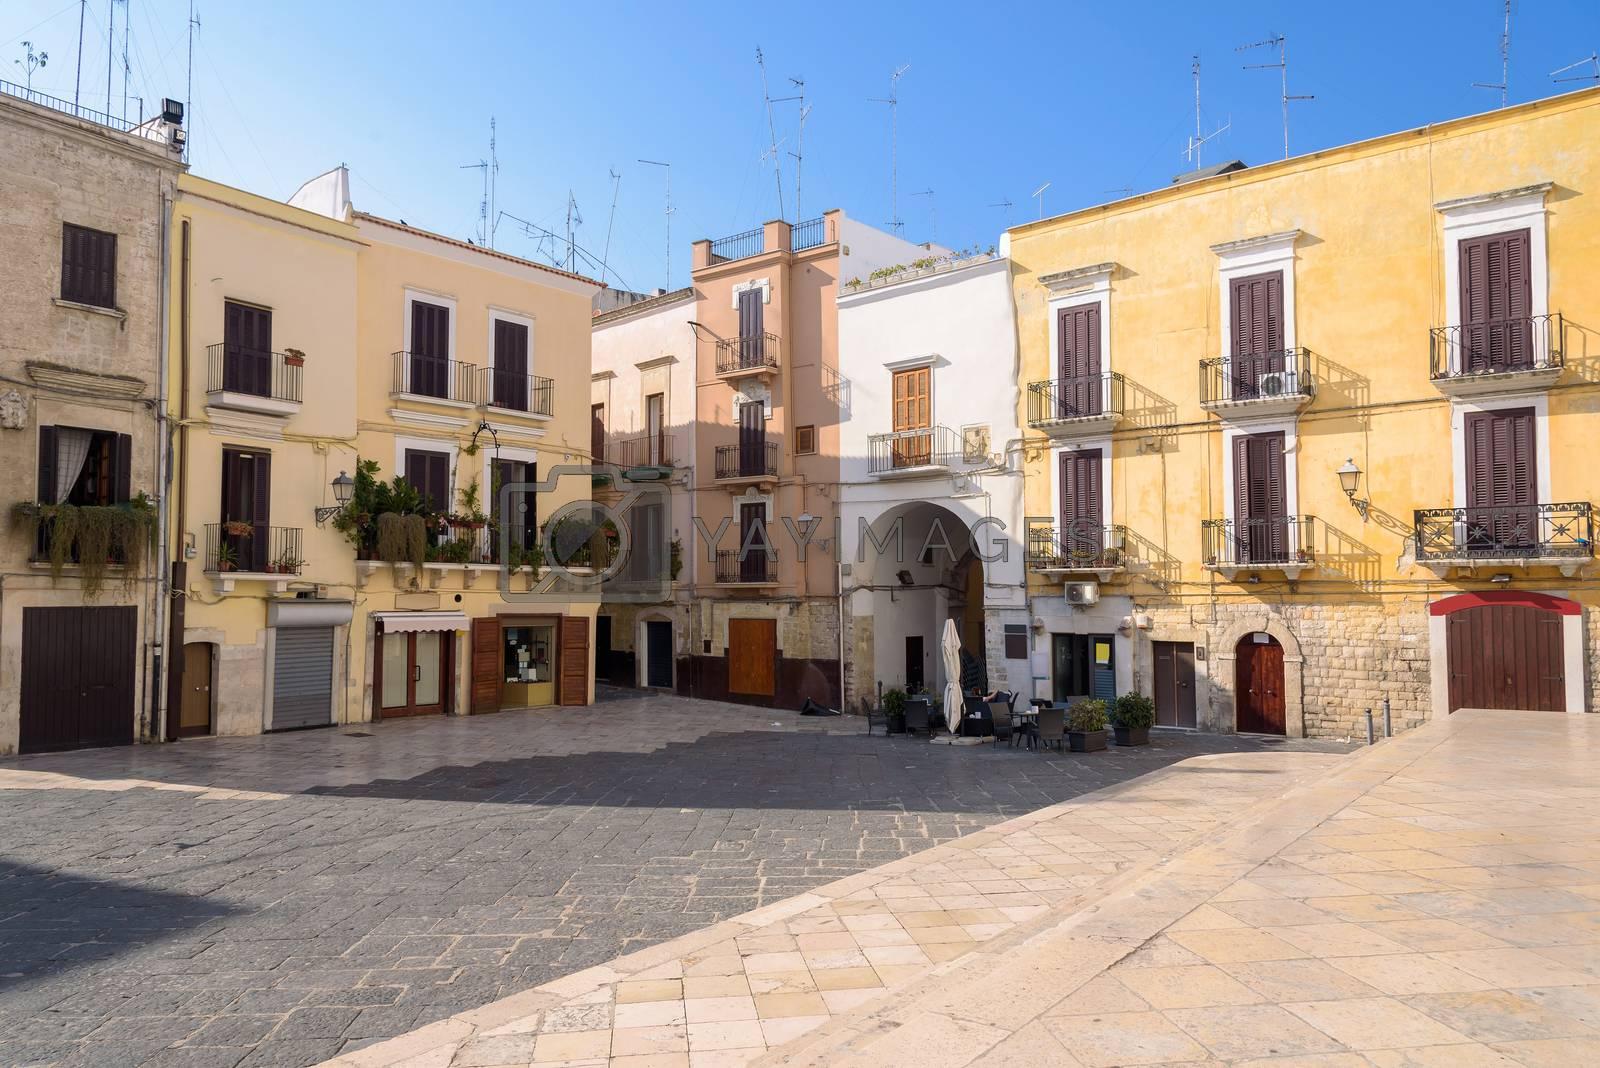 View of small town square called Piazza dell'Odegitria in Bari, Italy